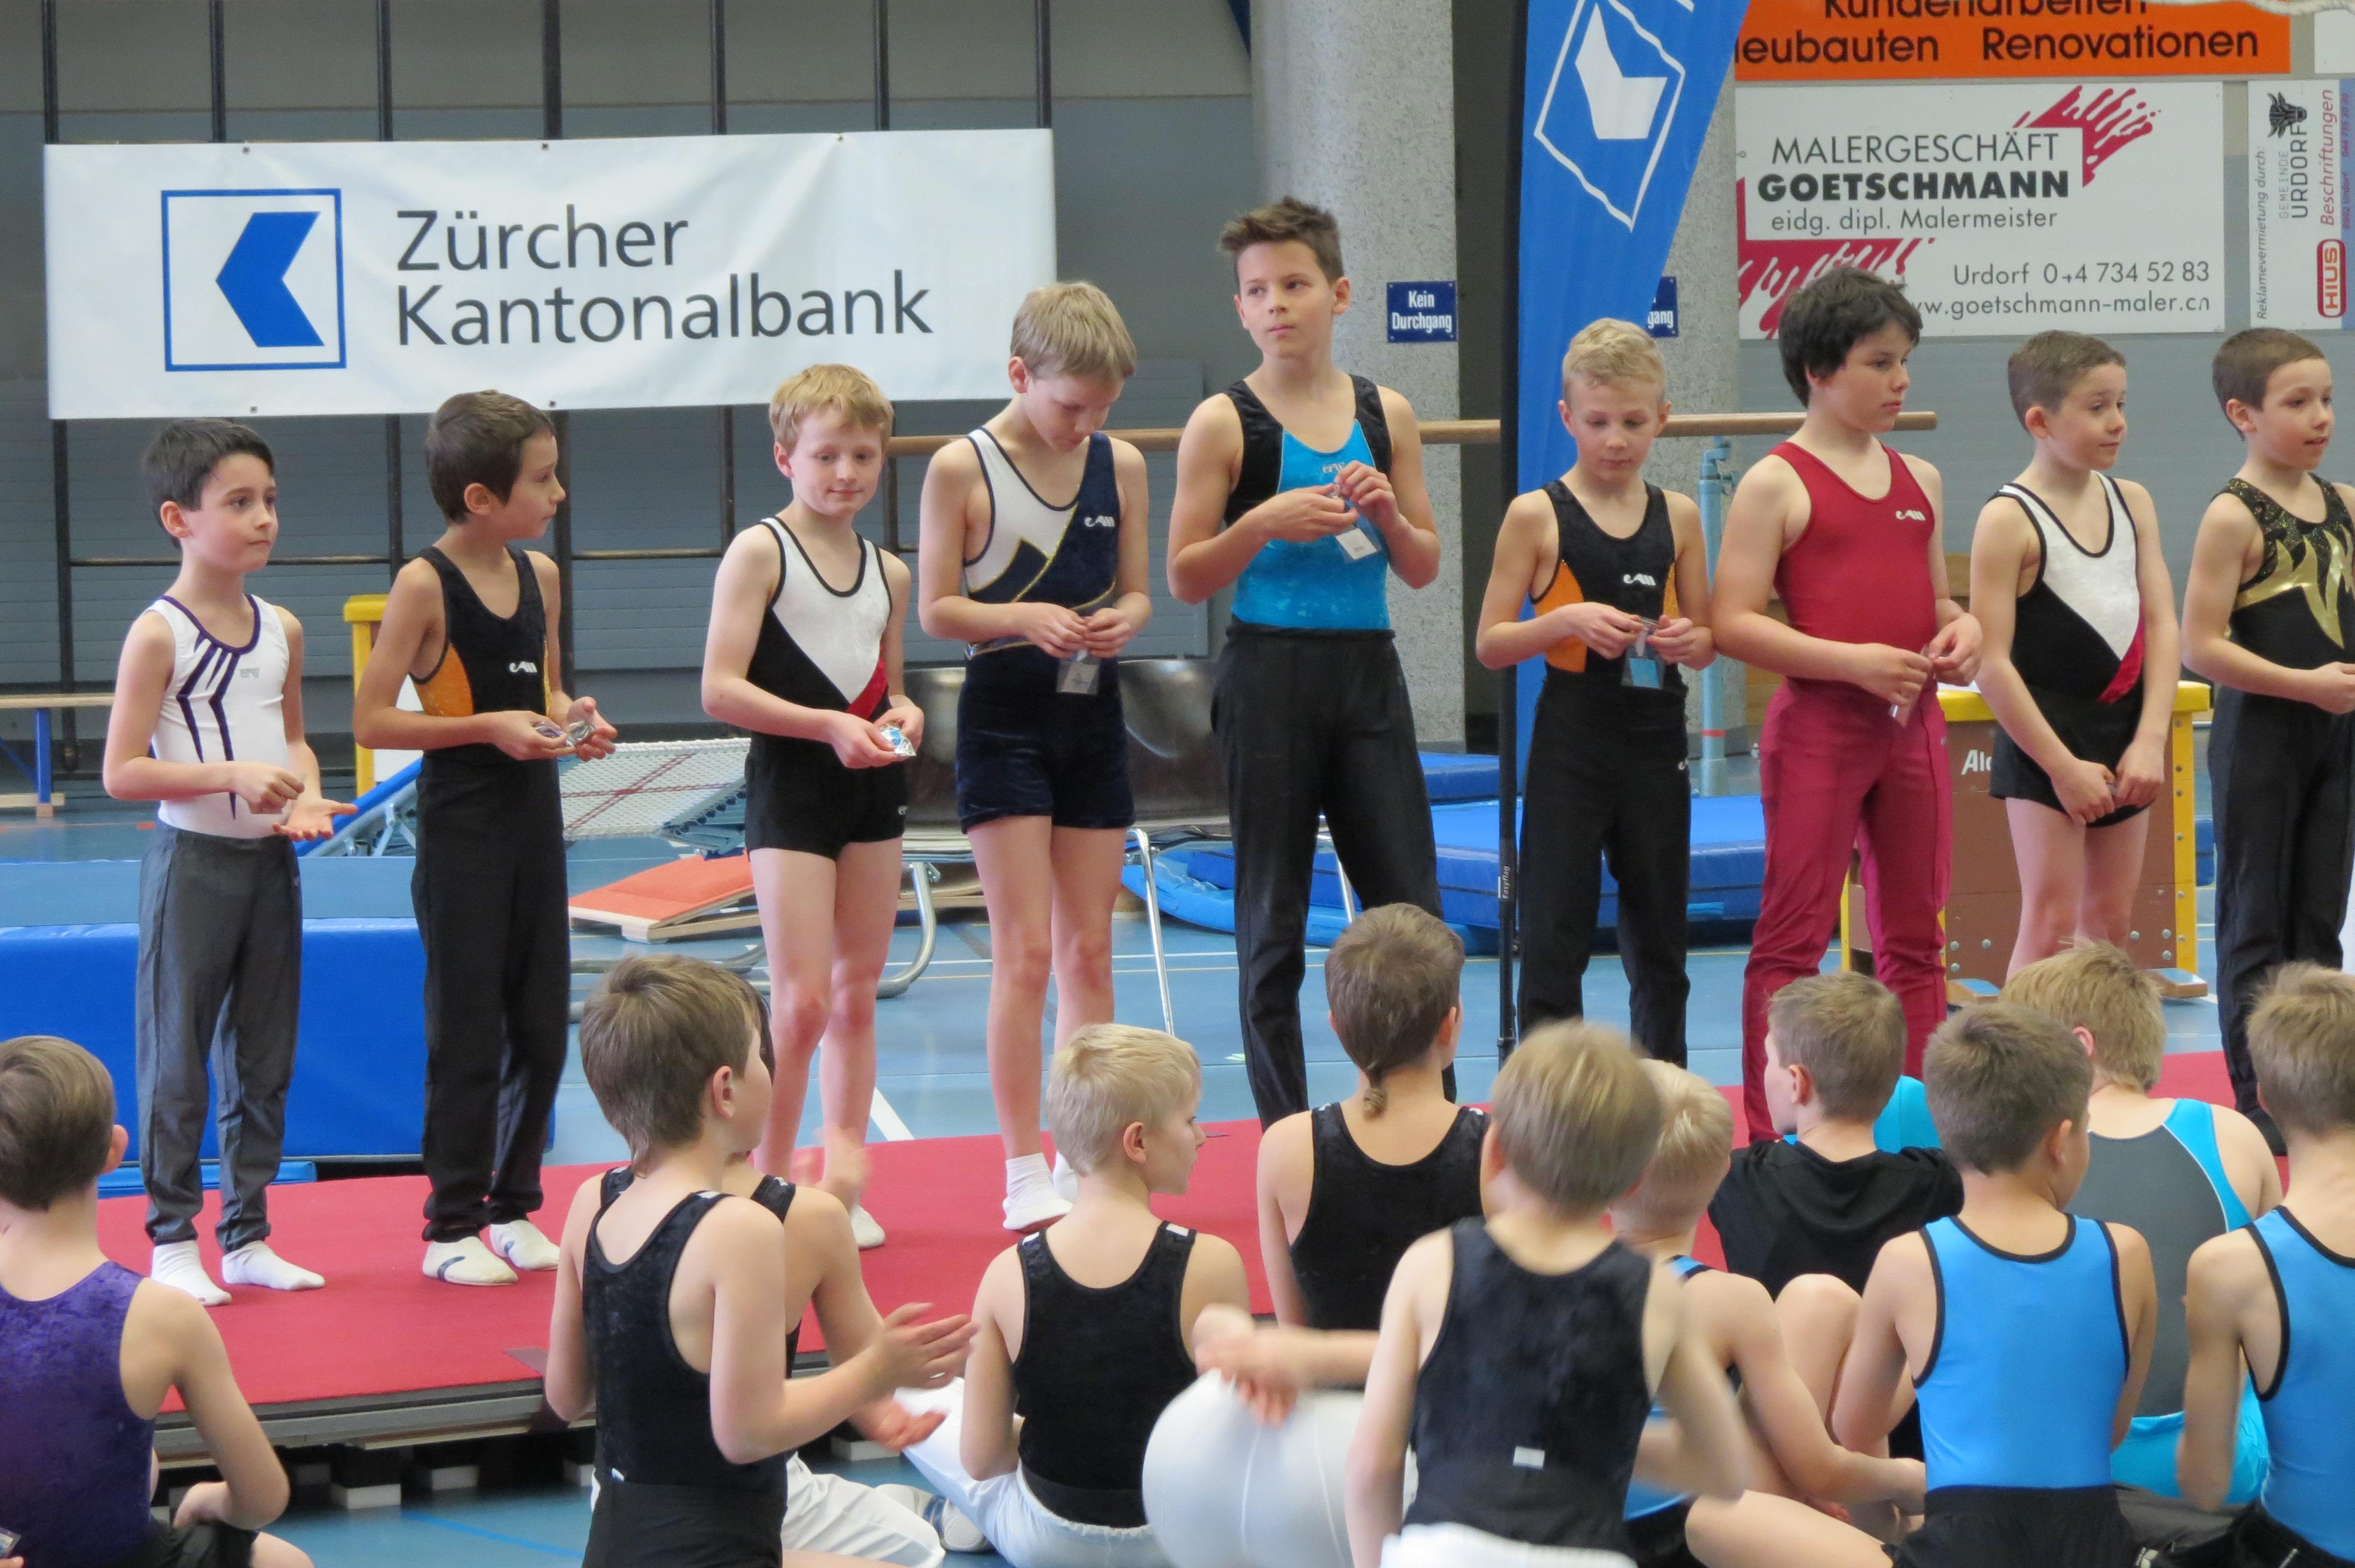 Frühlingswettkampf GETU 2015 Urdorf